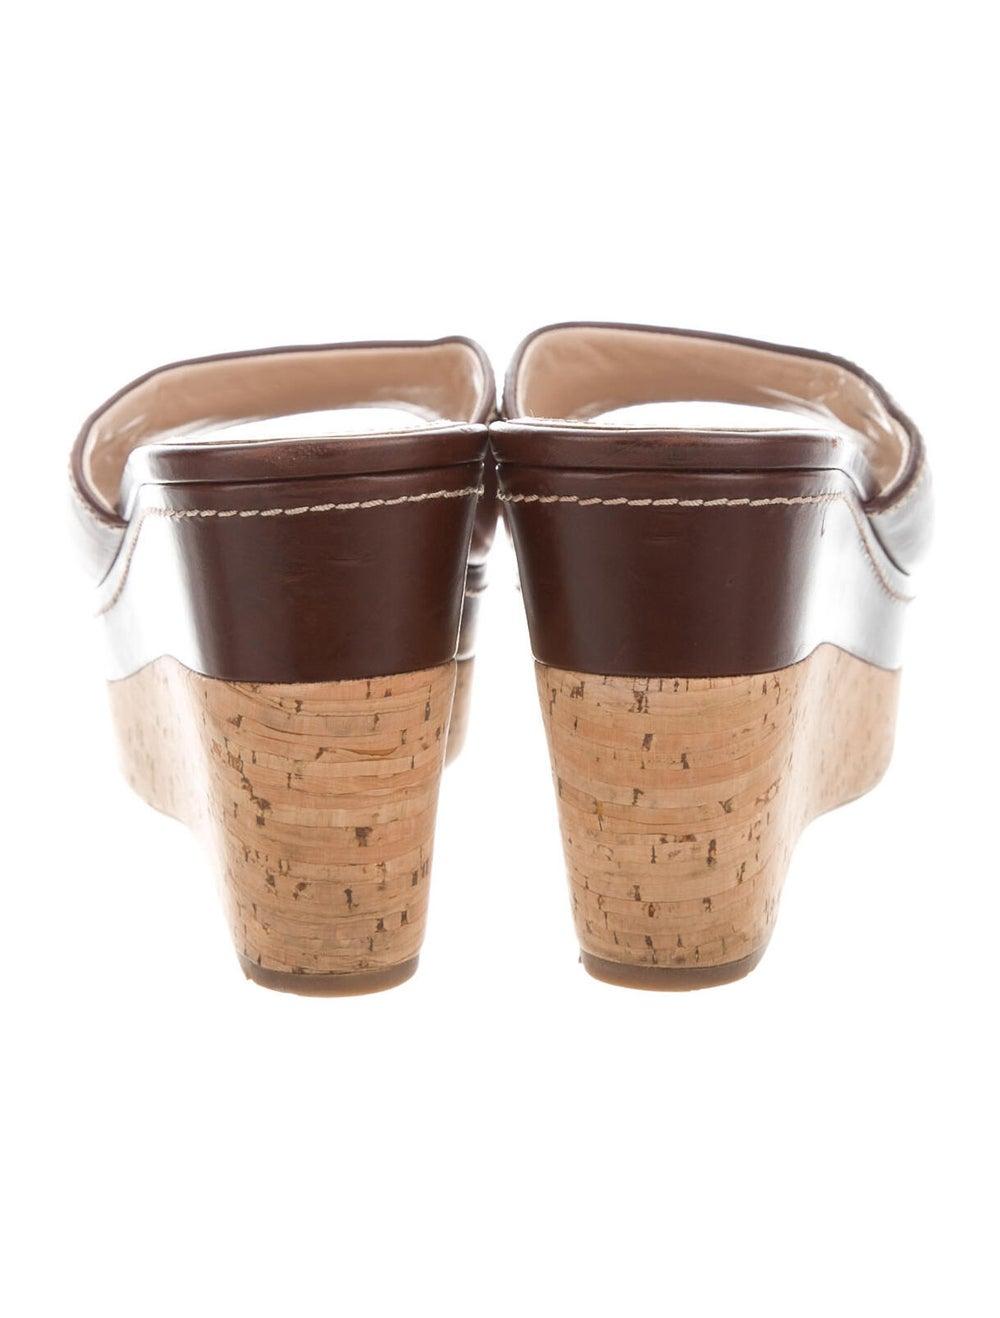 Prada Sport Leather Slides Brown - image 4